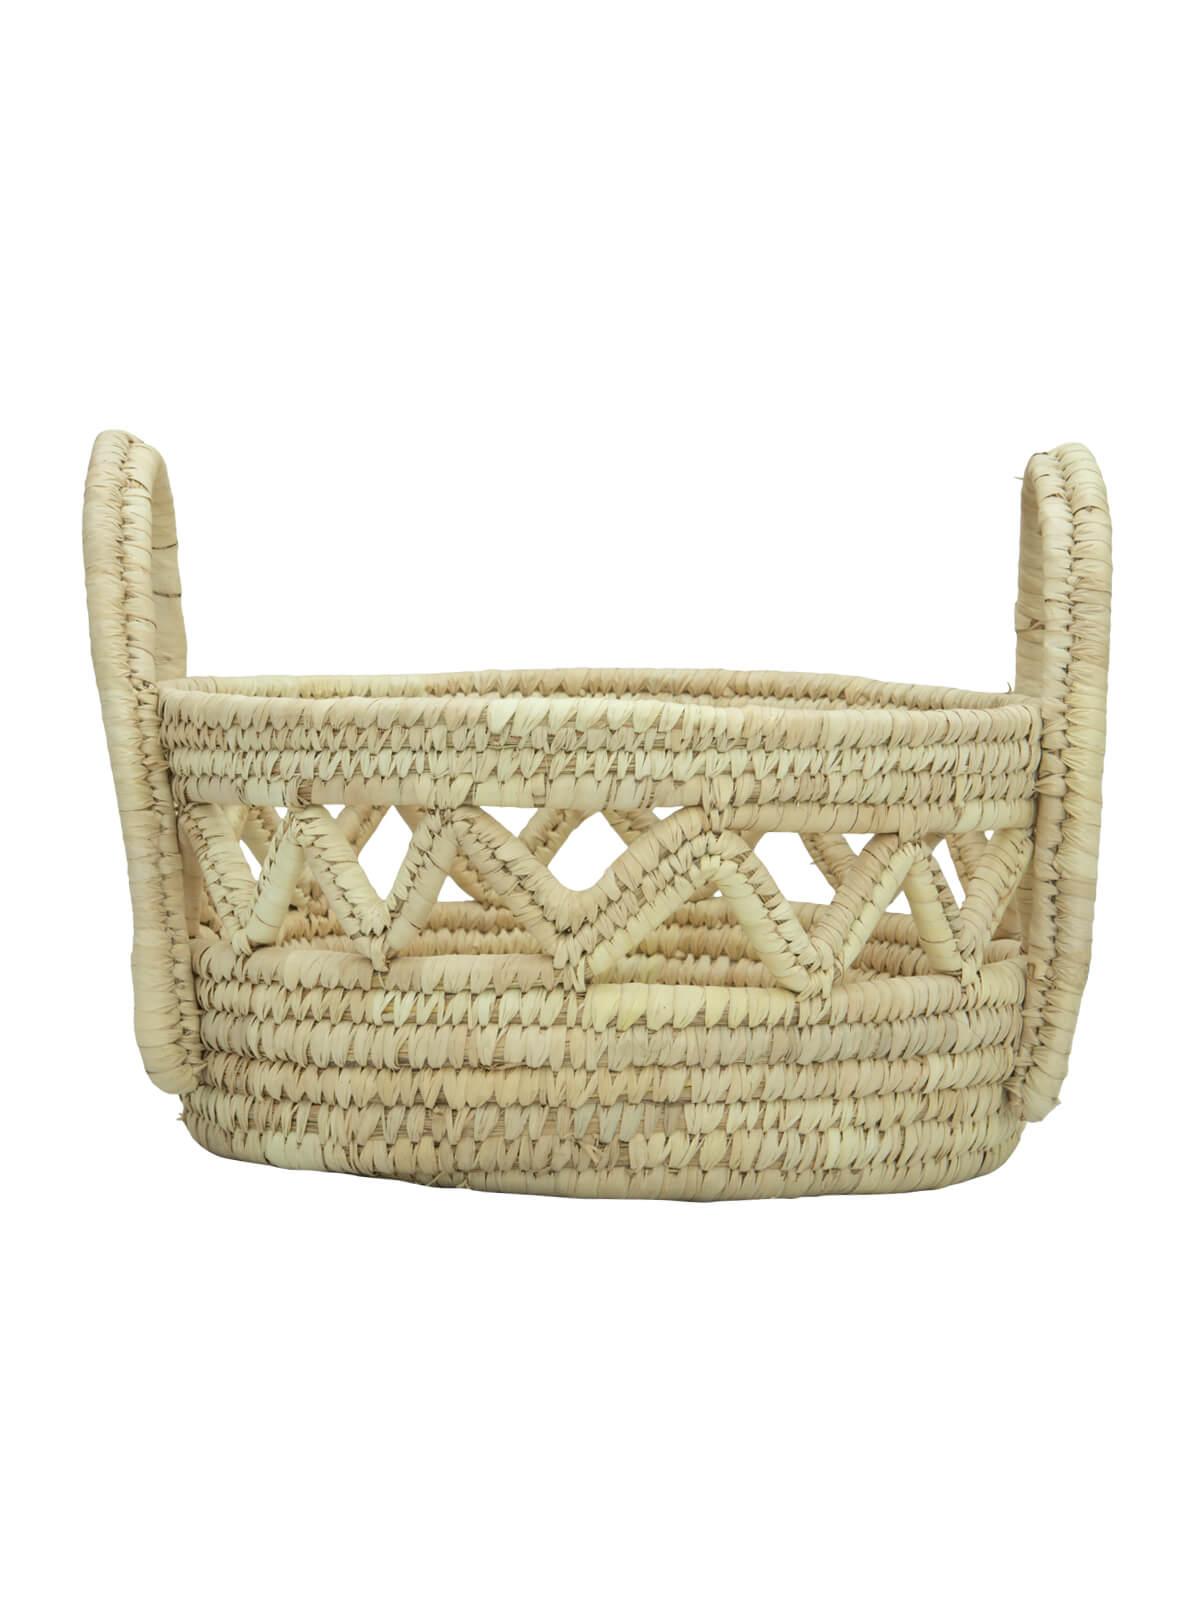 Kans Grass & Date leaf Woven Eco-Friendly Vegetable Basket